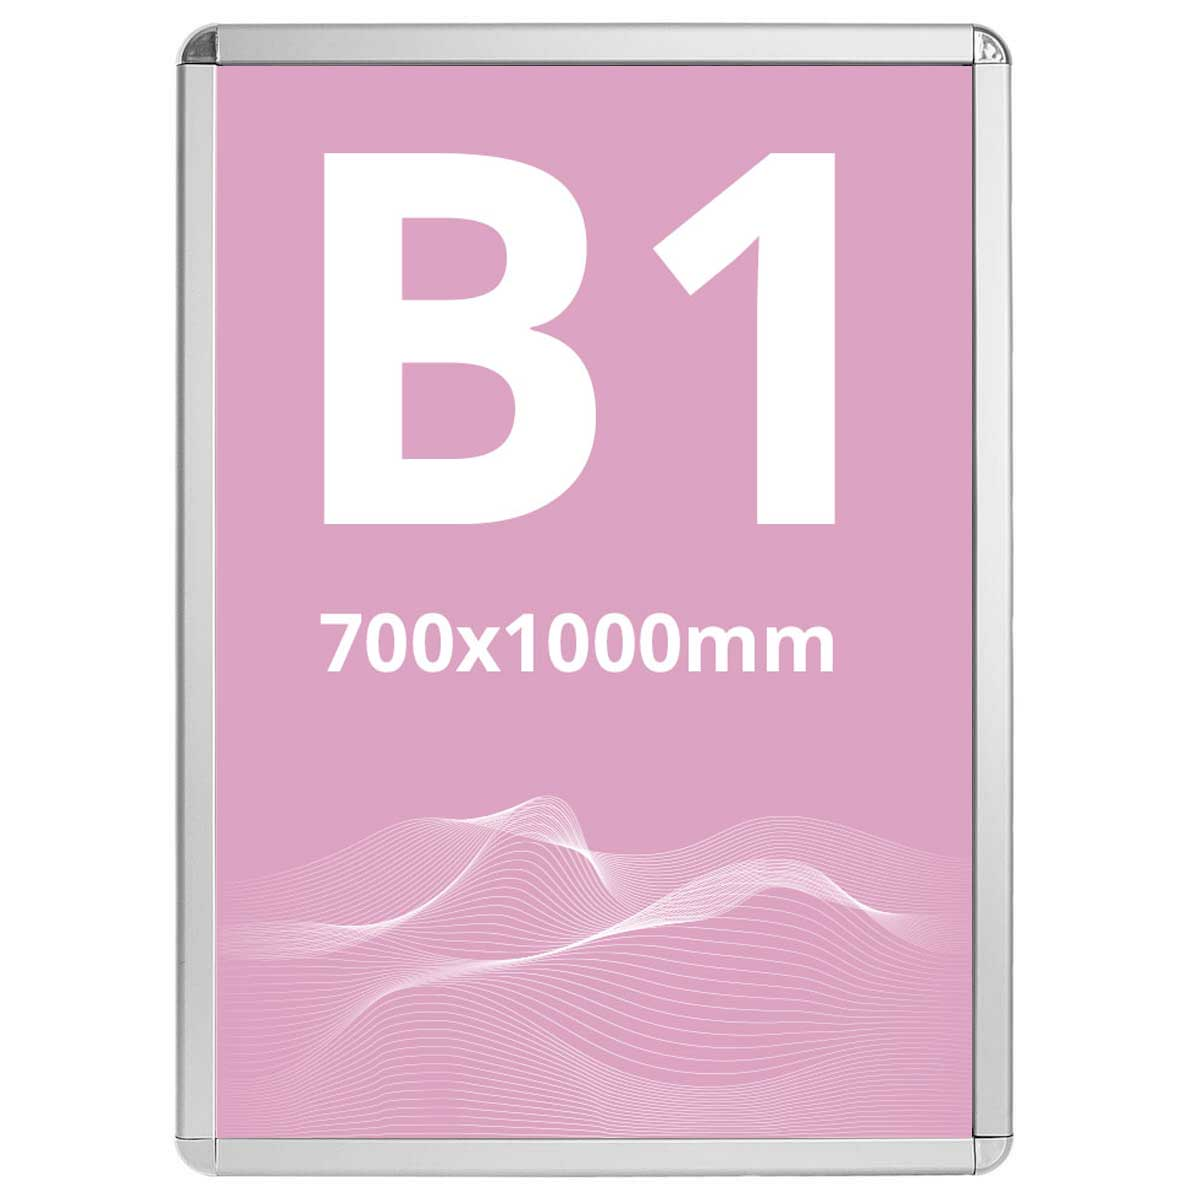 Ramă click Poster Frame din aluminiu 32, colțuri rotunde S7, JJ DISPLAYS, 700 x 1000 mm